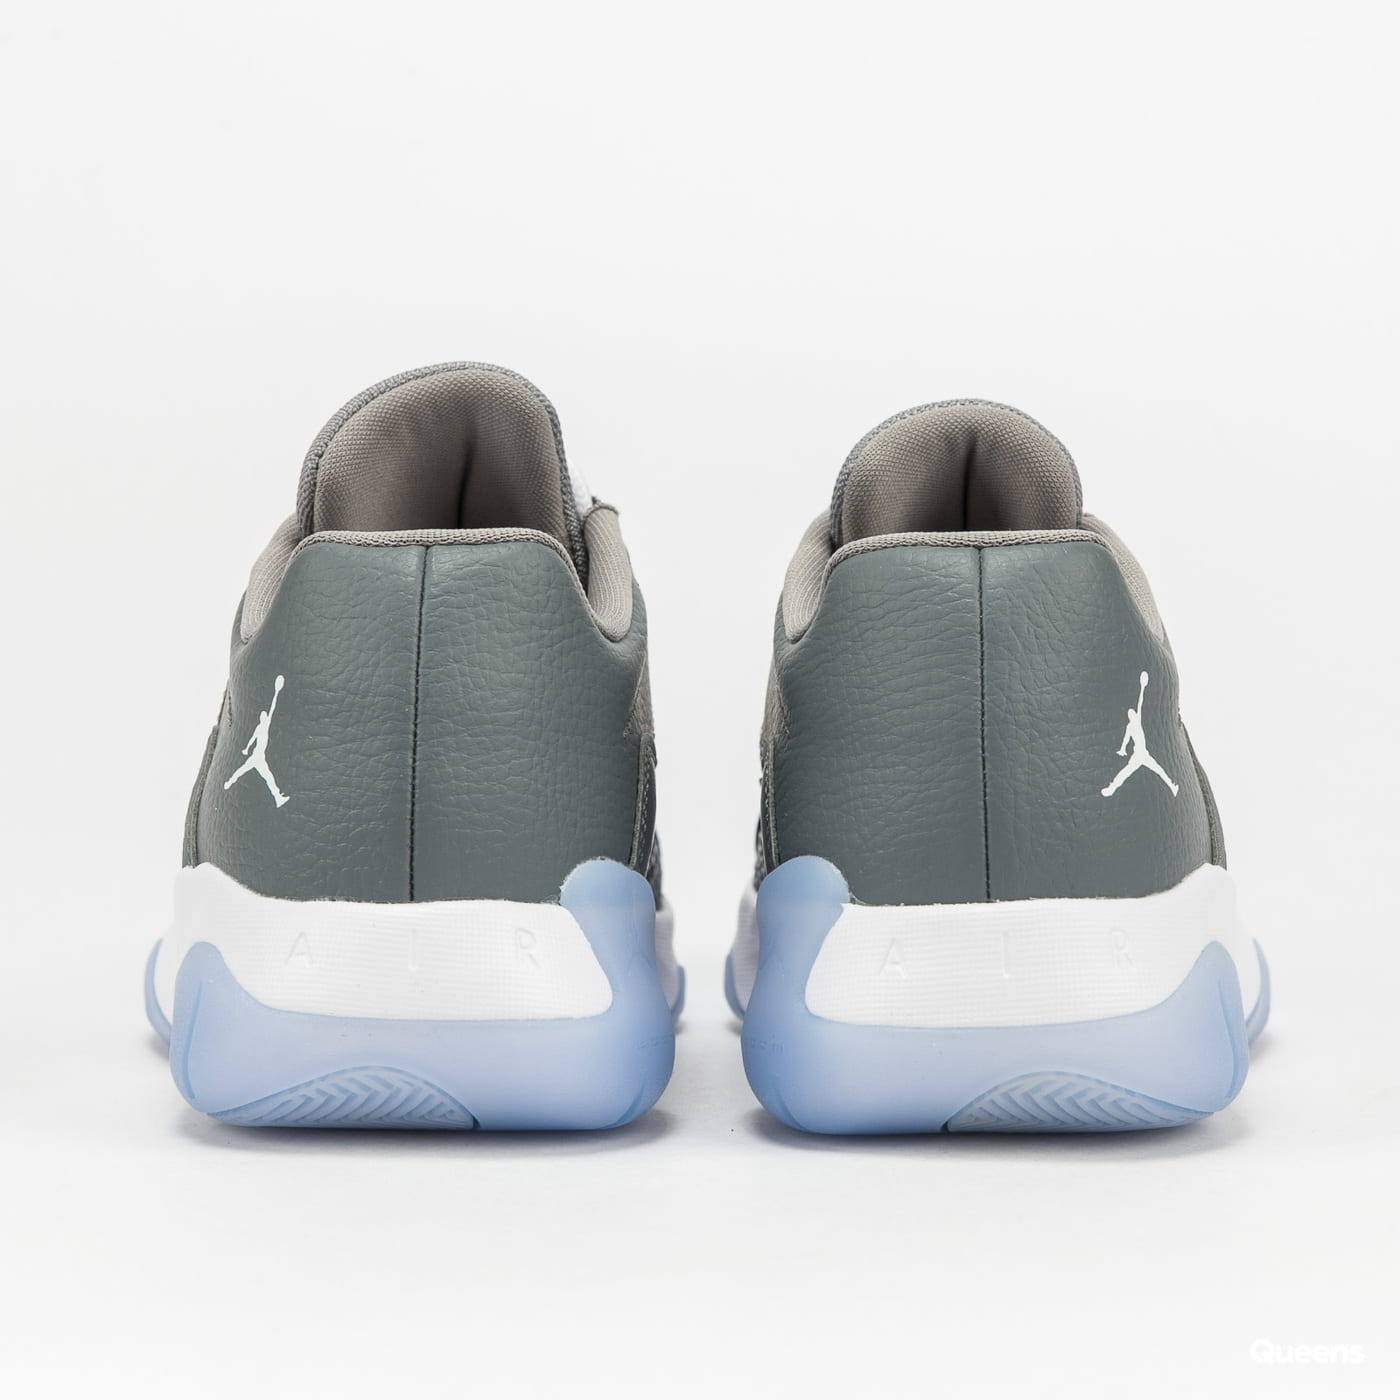 Jordan Air Jordan 11 CMFT Low (GS) cool grey / white - medium grey